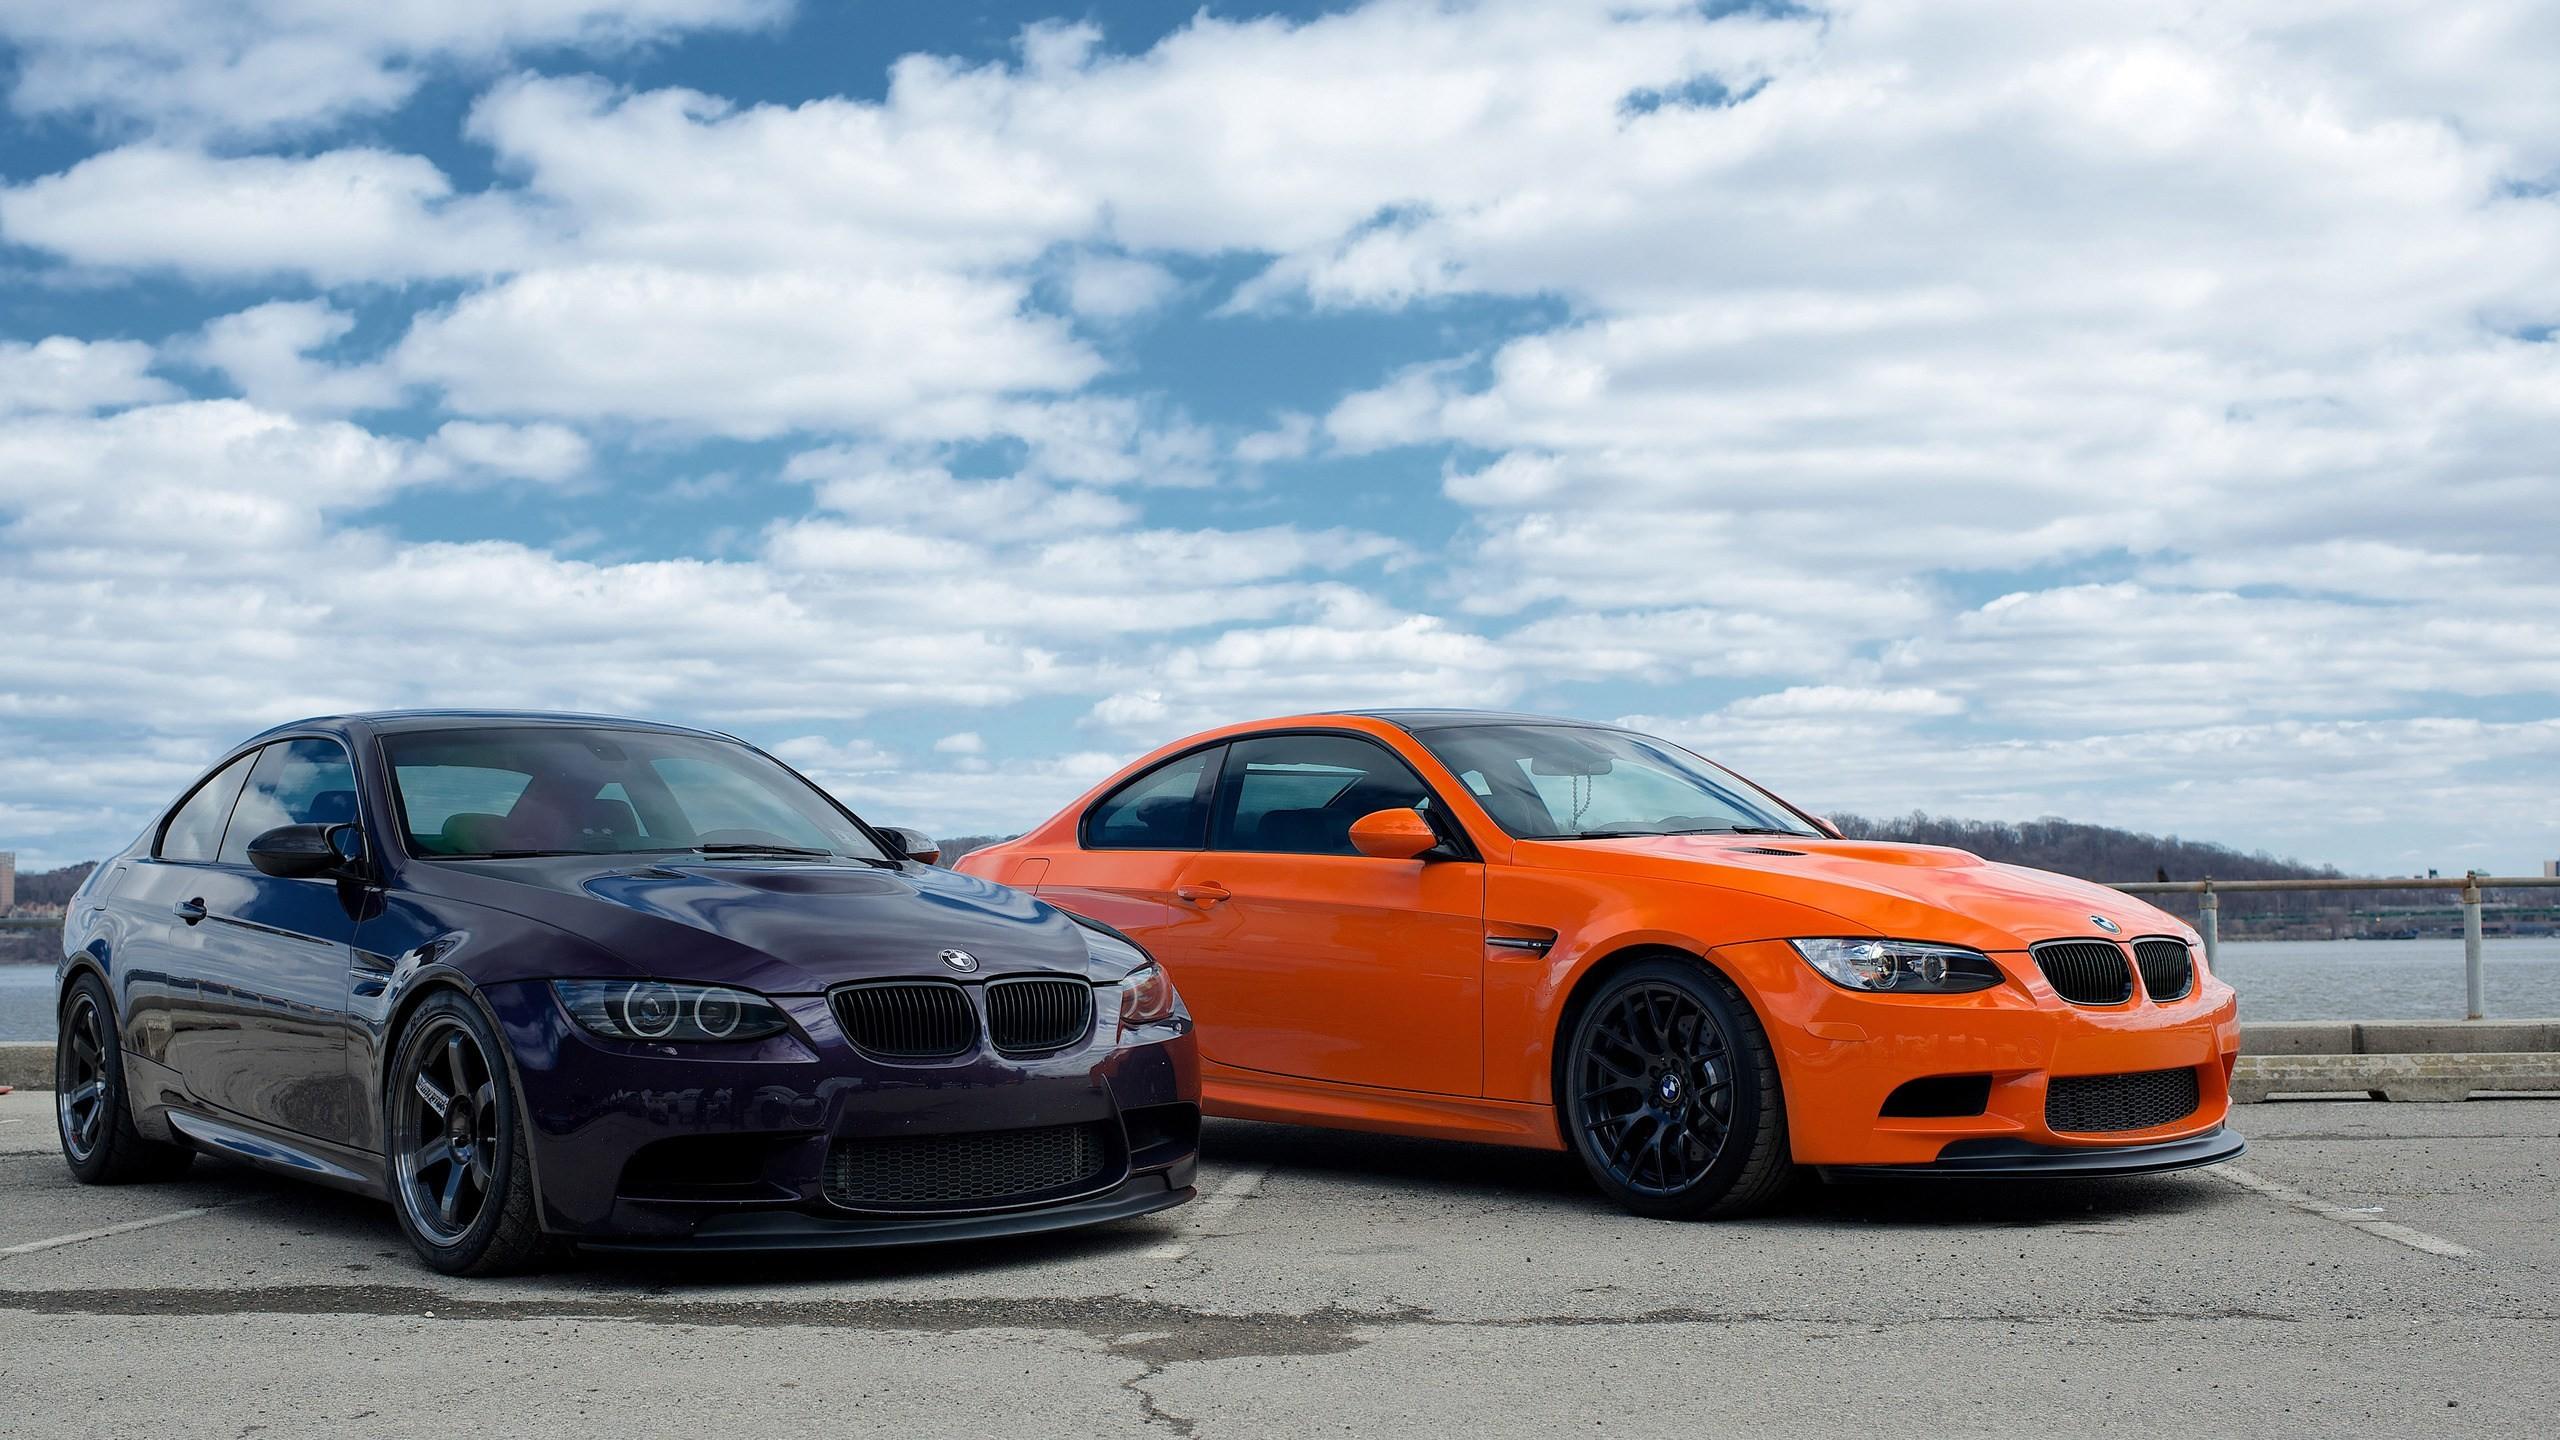 BMW M5 Wallpaper (76+ Images